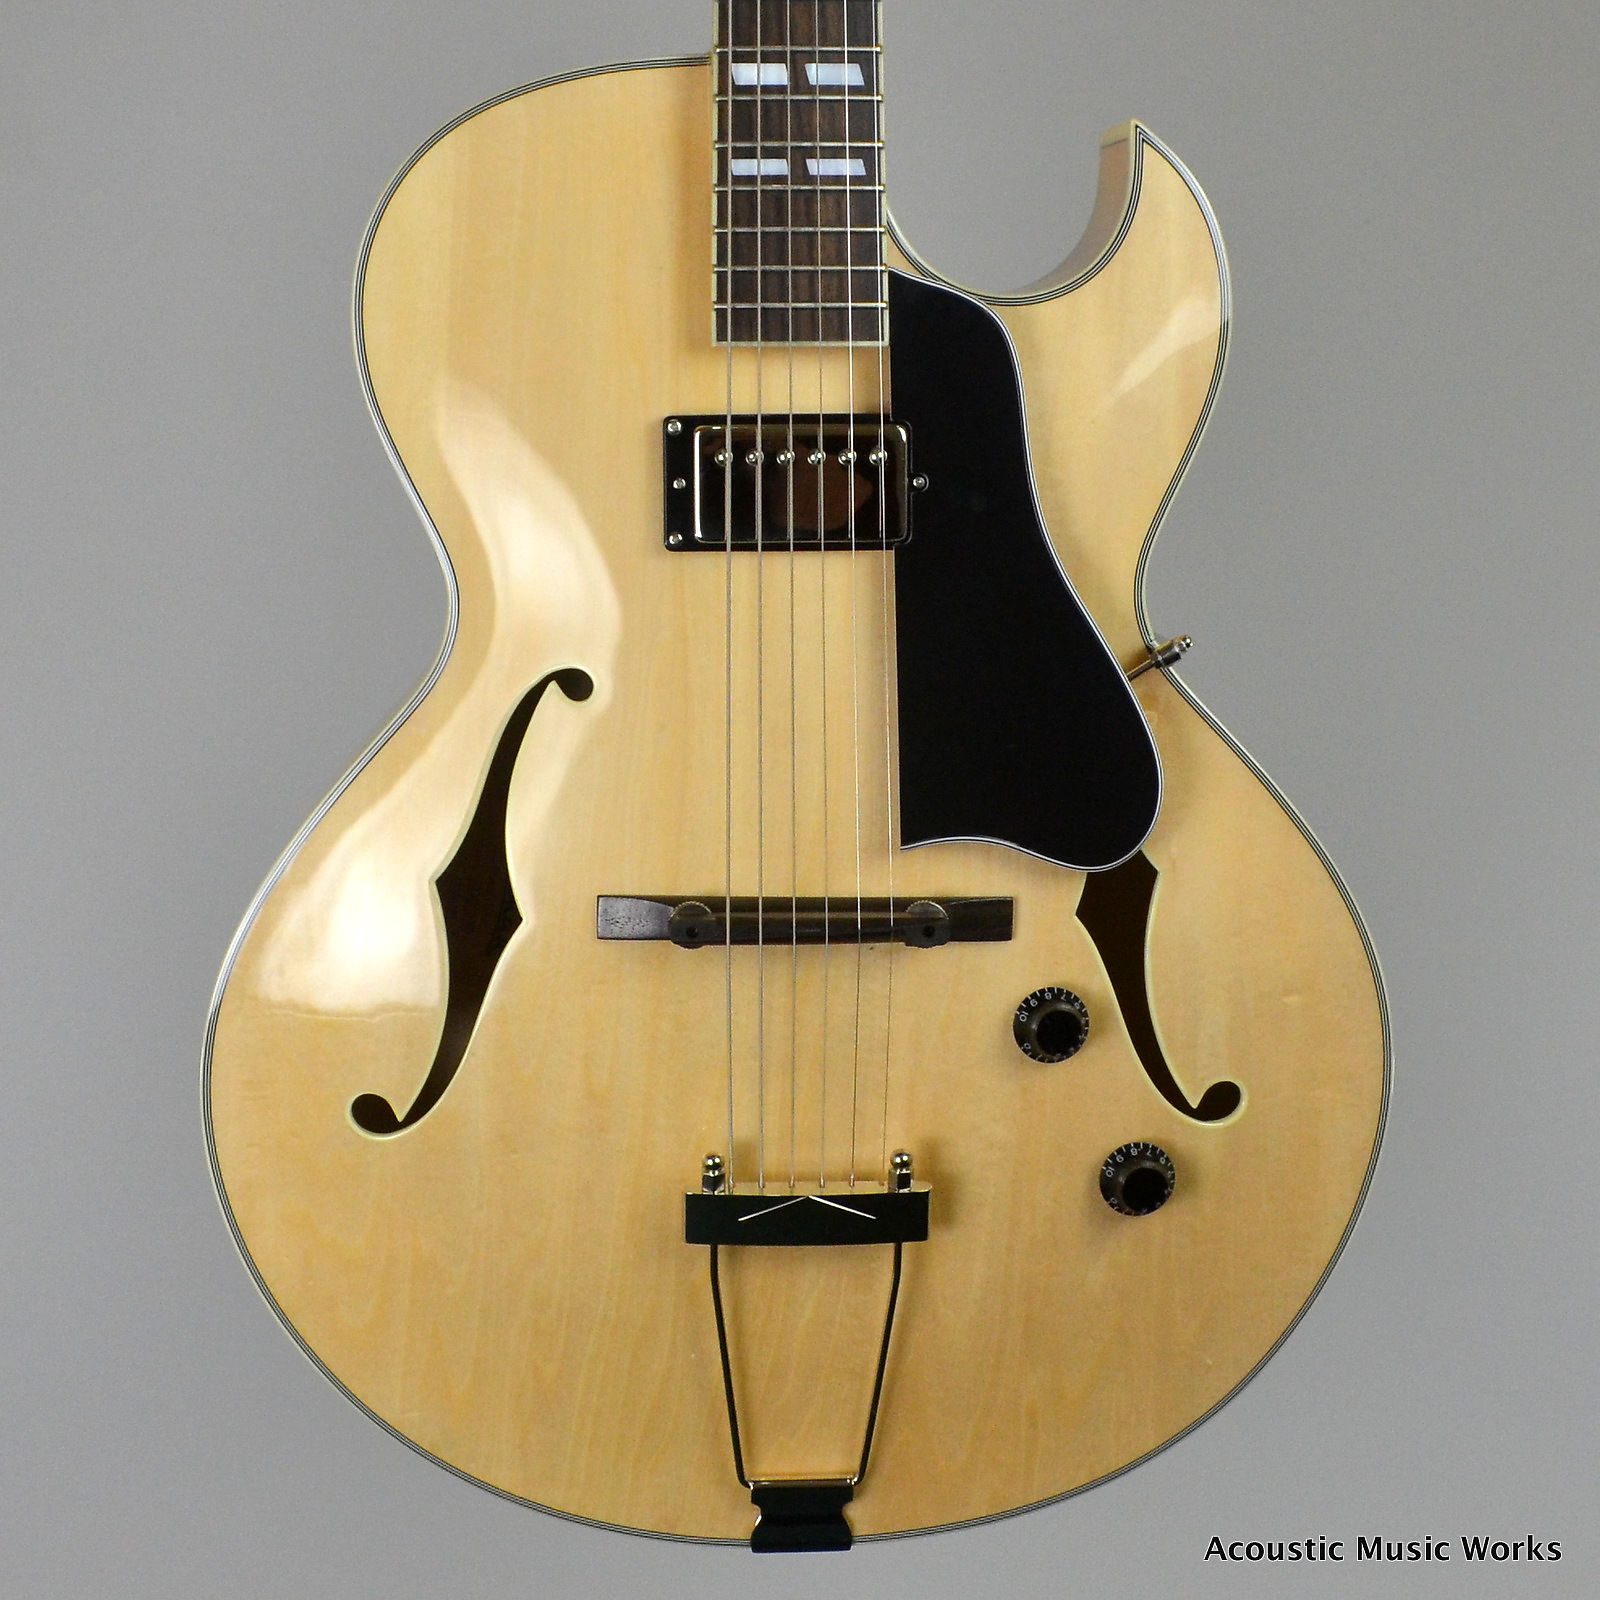 eastman ar371ce bd archtop guitar single humbucker. Black Bedroom Furniture Sets. Home Design Ideas